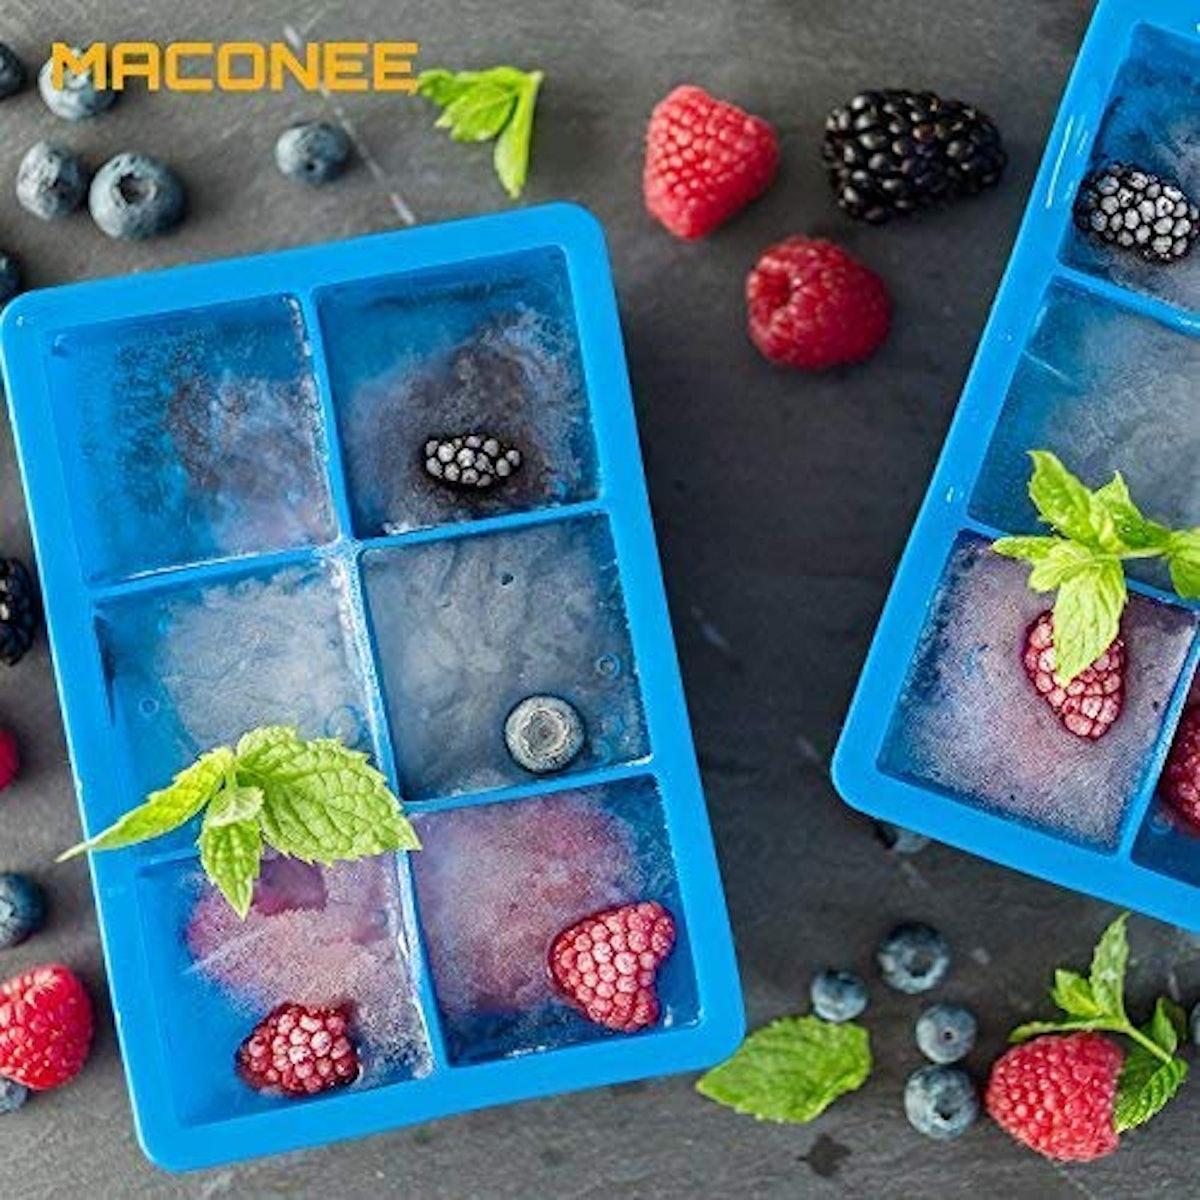 Maconee Ice Cube Trays (2-Pack)